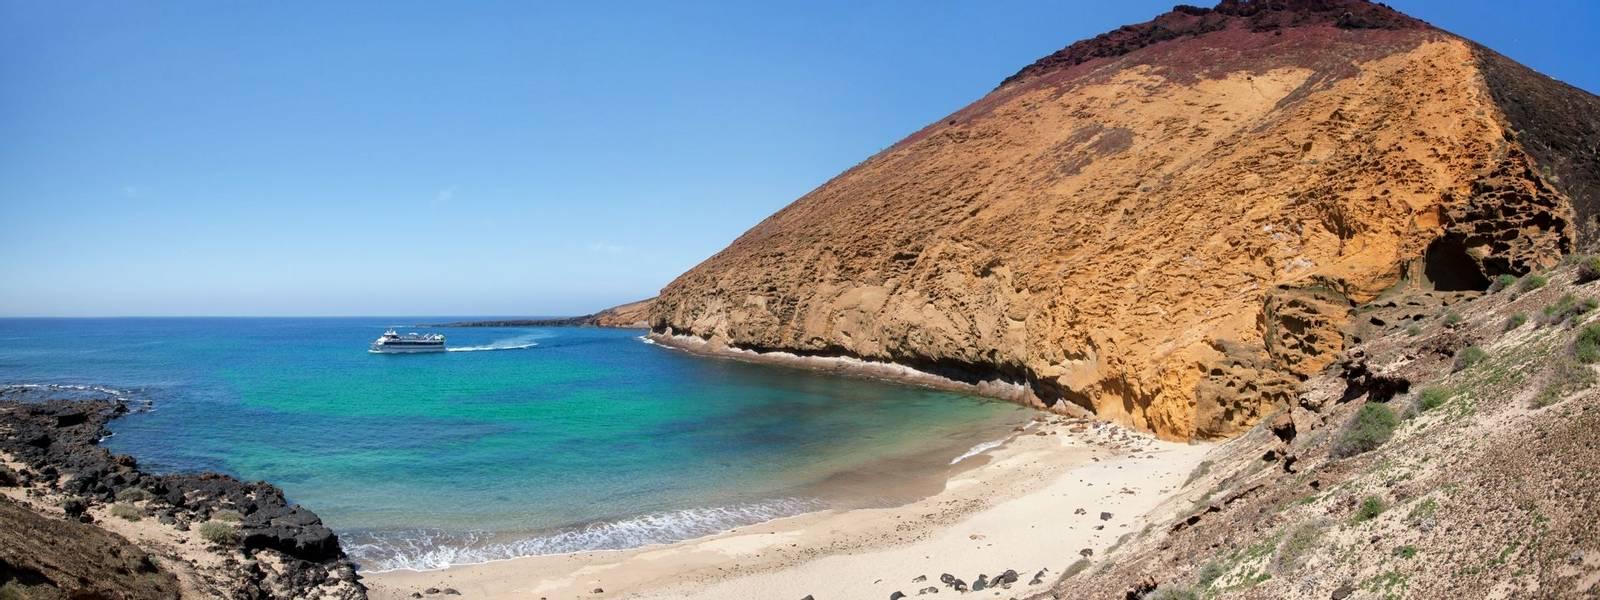 Spain - Lanzarote - Teguise Beach - AdobeStock_69669703.jpeg